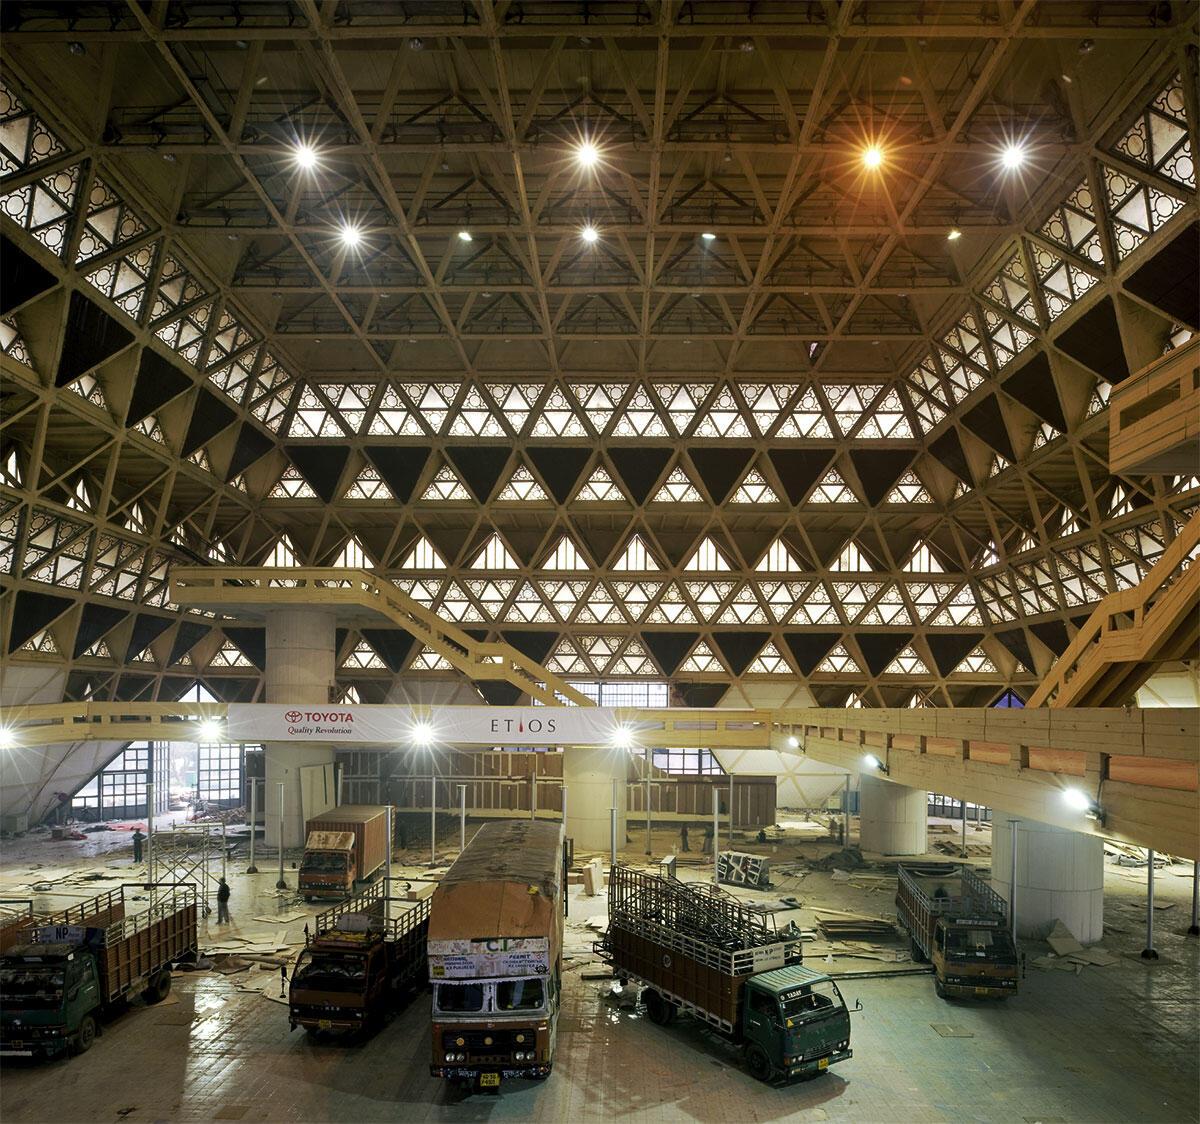 Hall of Nations, Innenaufnahme der Messehalle. Mahendra Raj Consultants, mit Raj Rewal und Kuldip Singh, New Delhi 1970-72